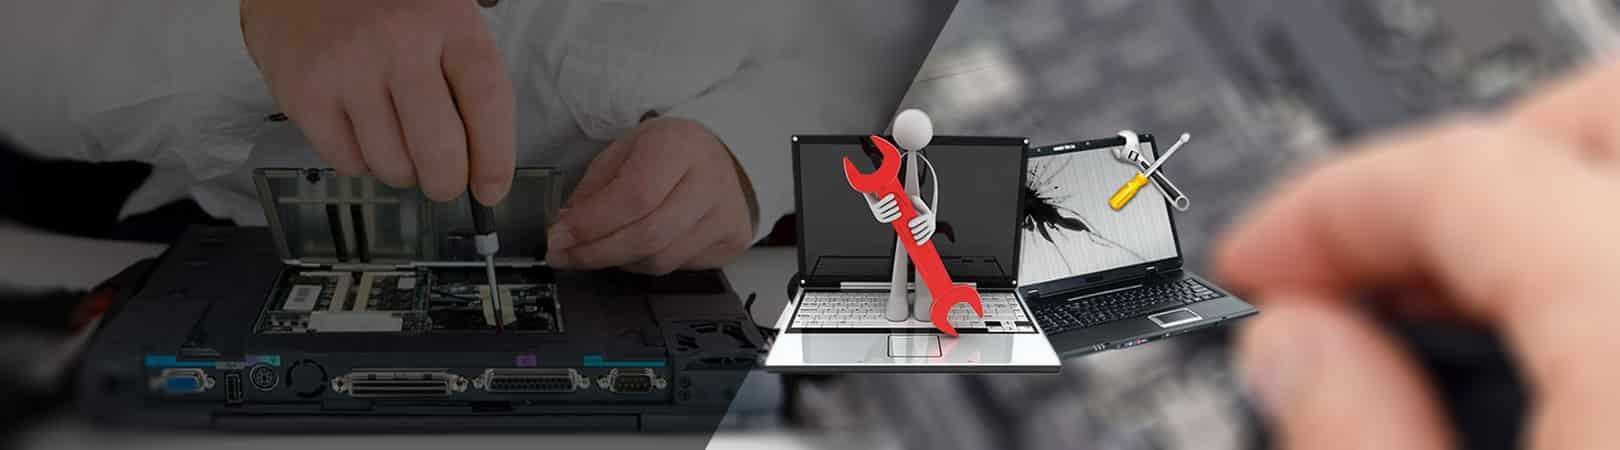 banner image - Samsung Laptop Heating Repair